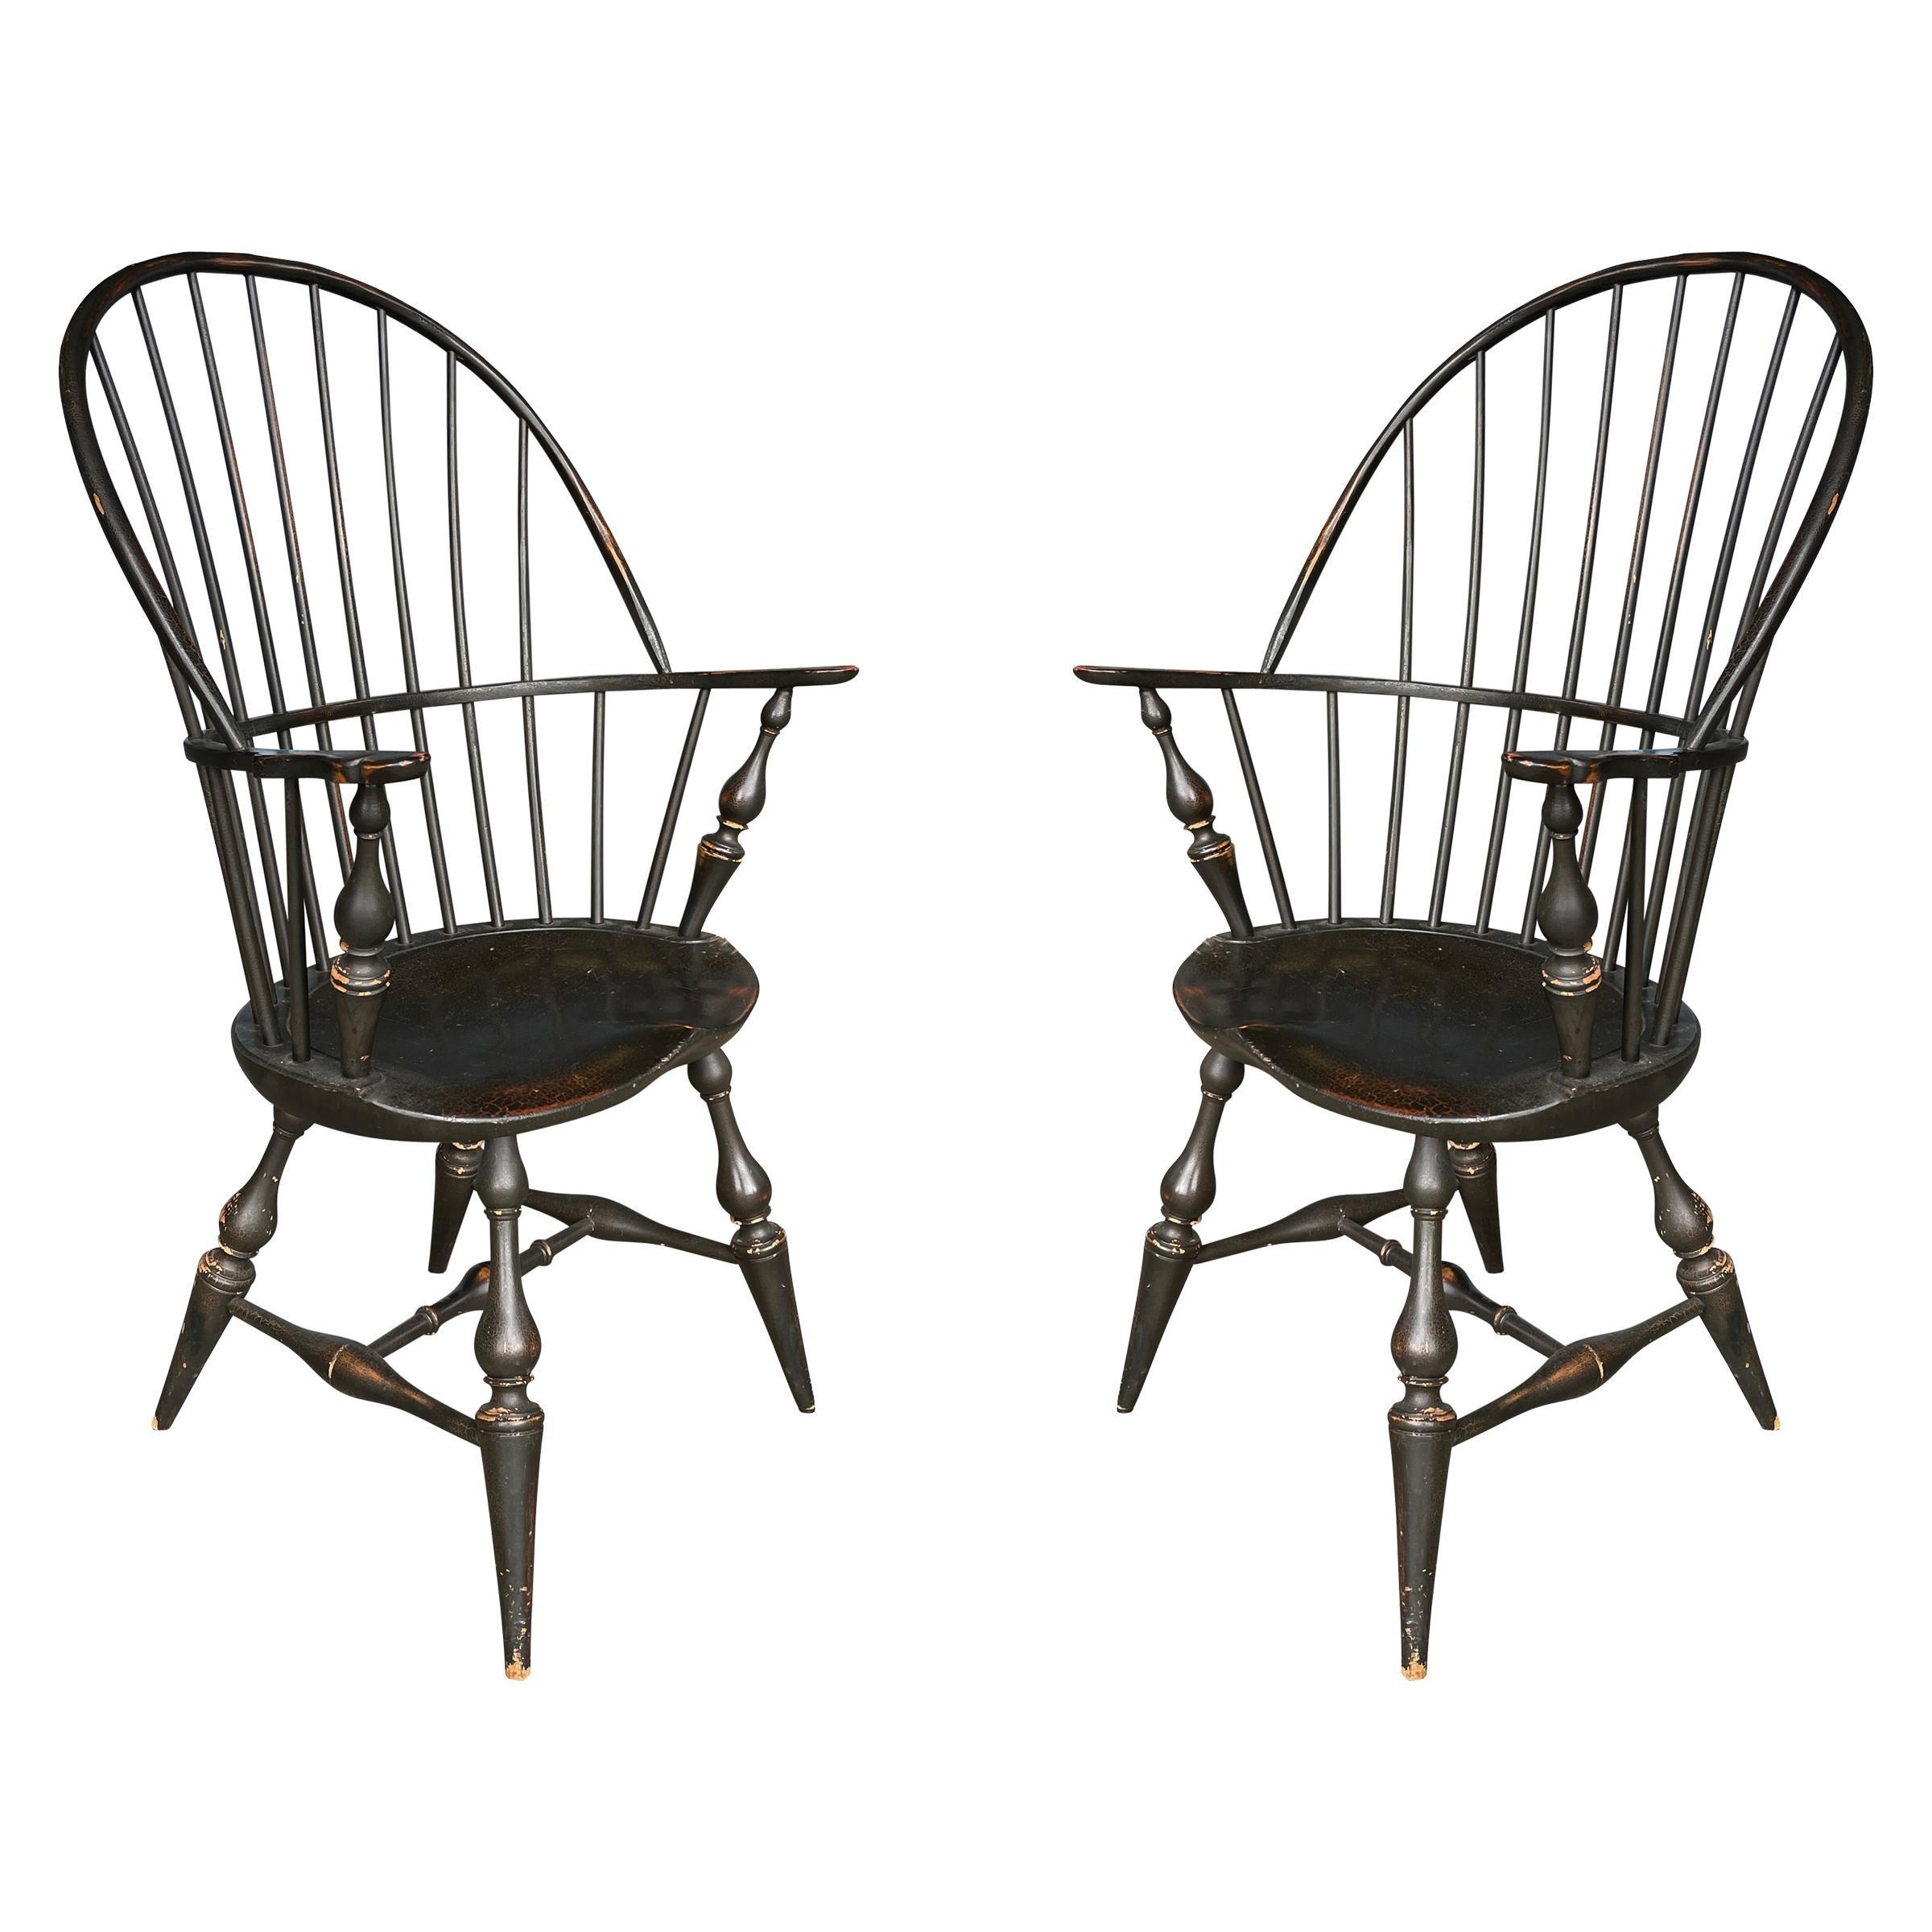 Pair of American Hoopback Windsor Chairs